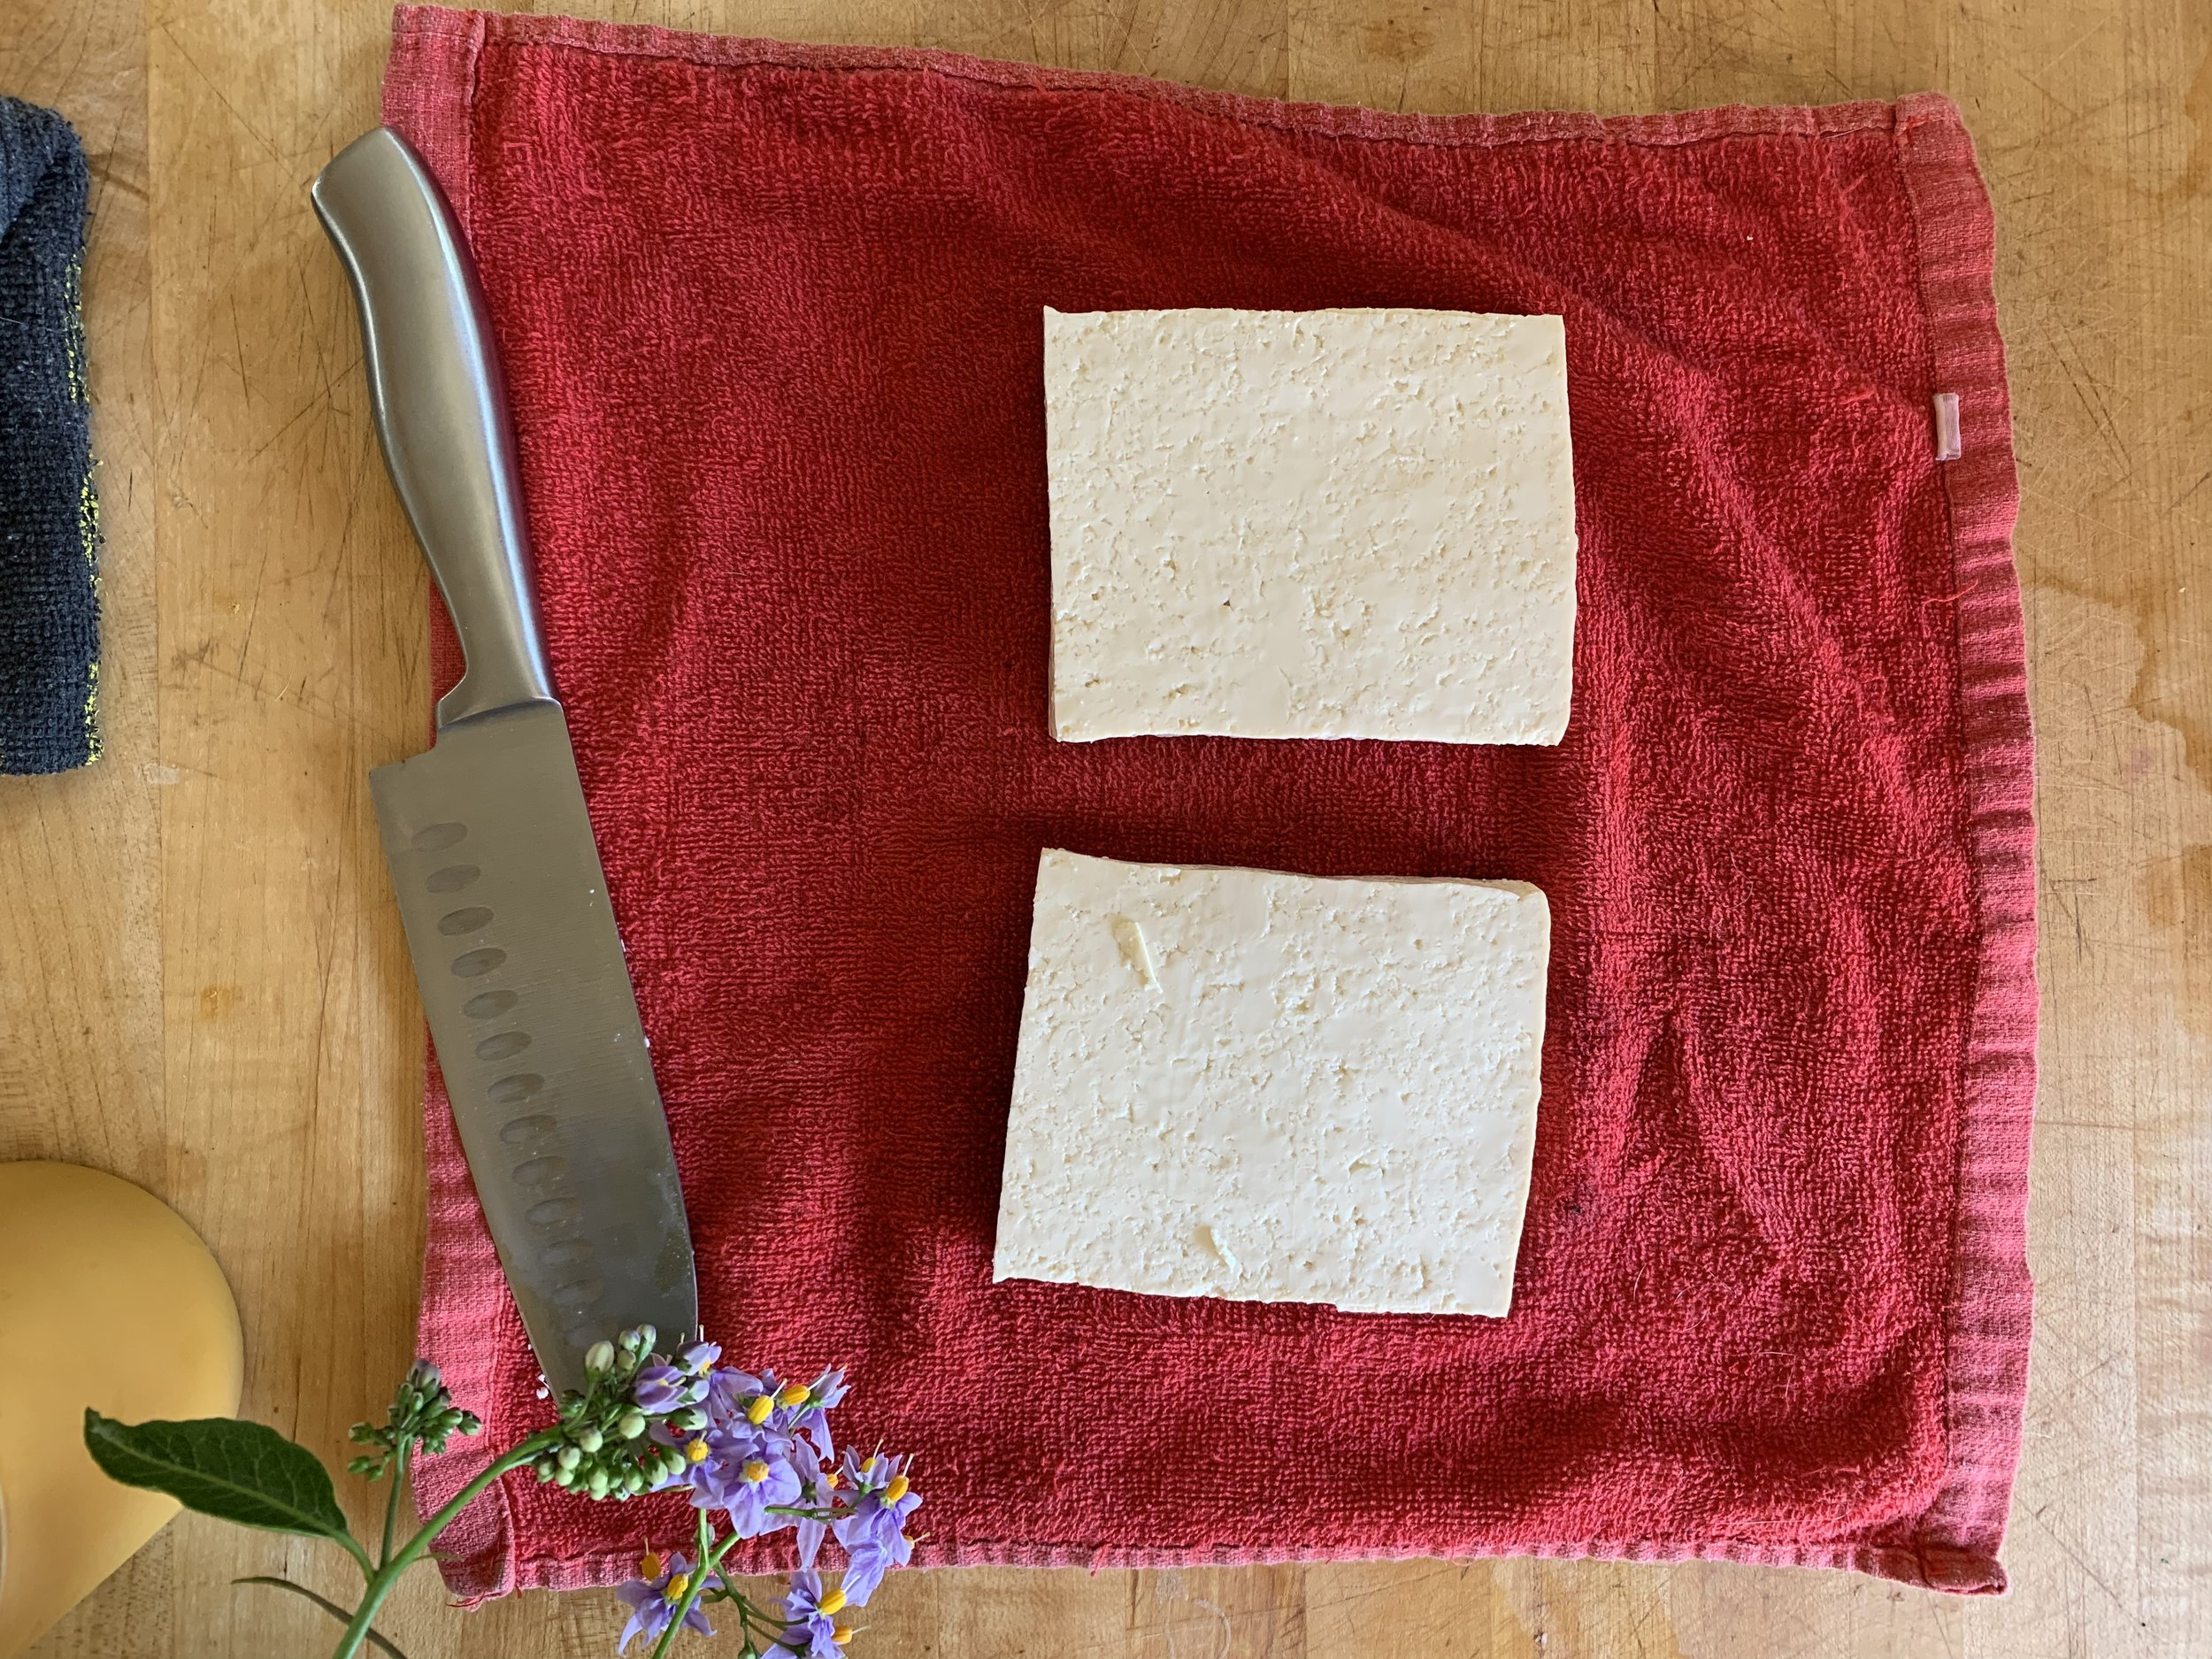 Tofu cut.jpg